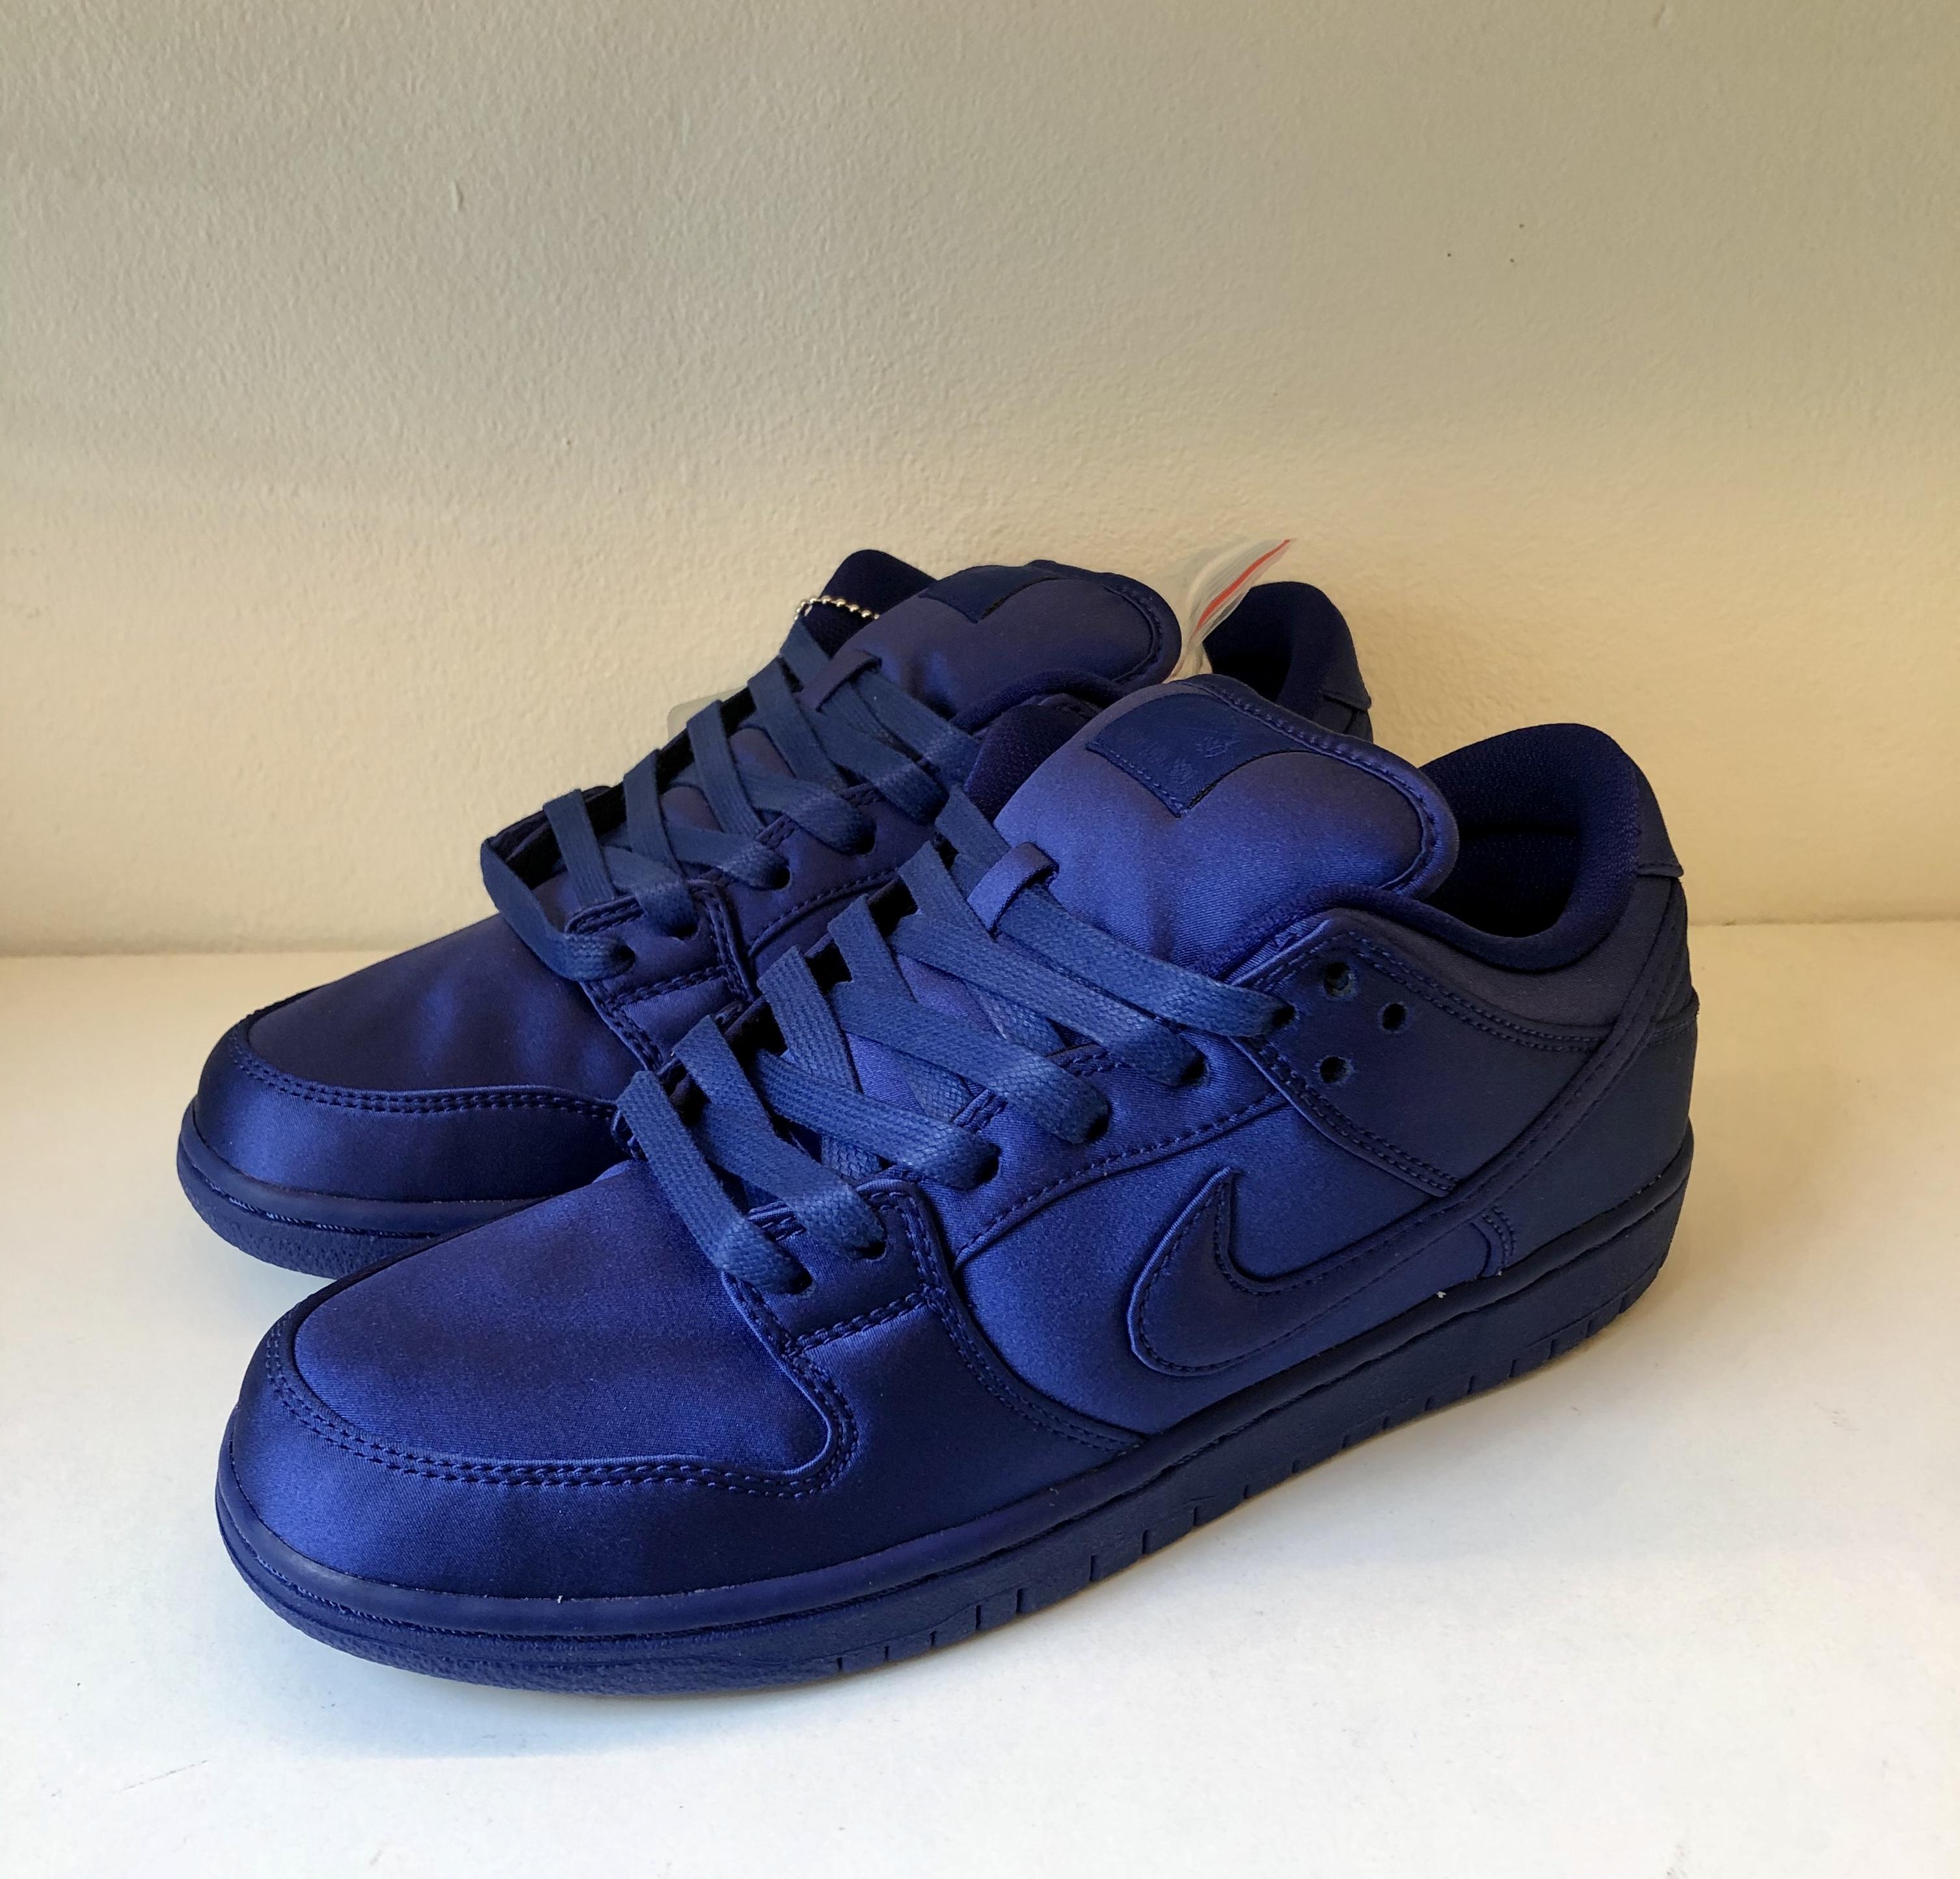 Nike SB Dunk Low NBA Deep Royal Blue